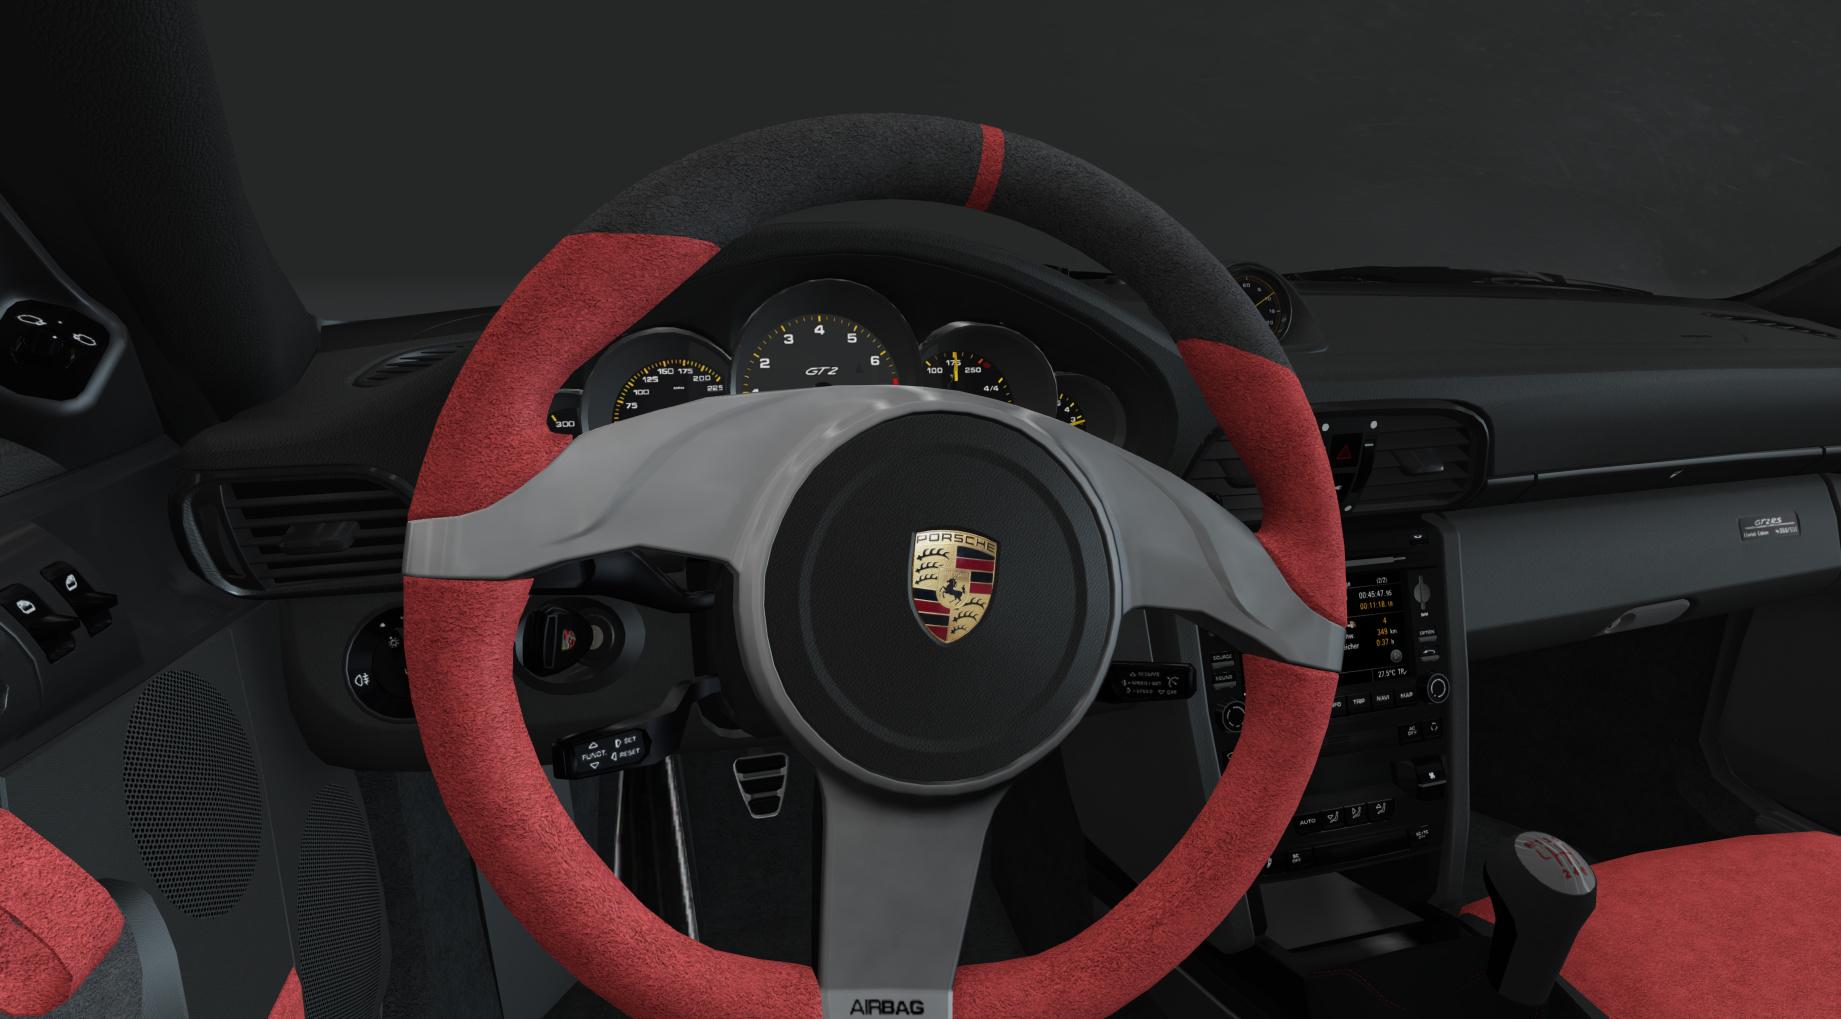 Porsche 997 GT2RS complete revision 2017 Assetto Corsa 1.14 012.jpg